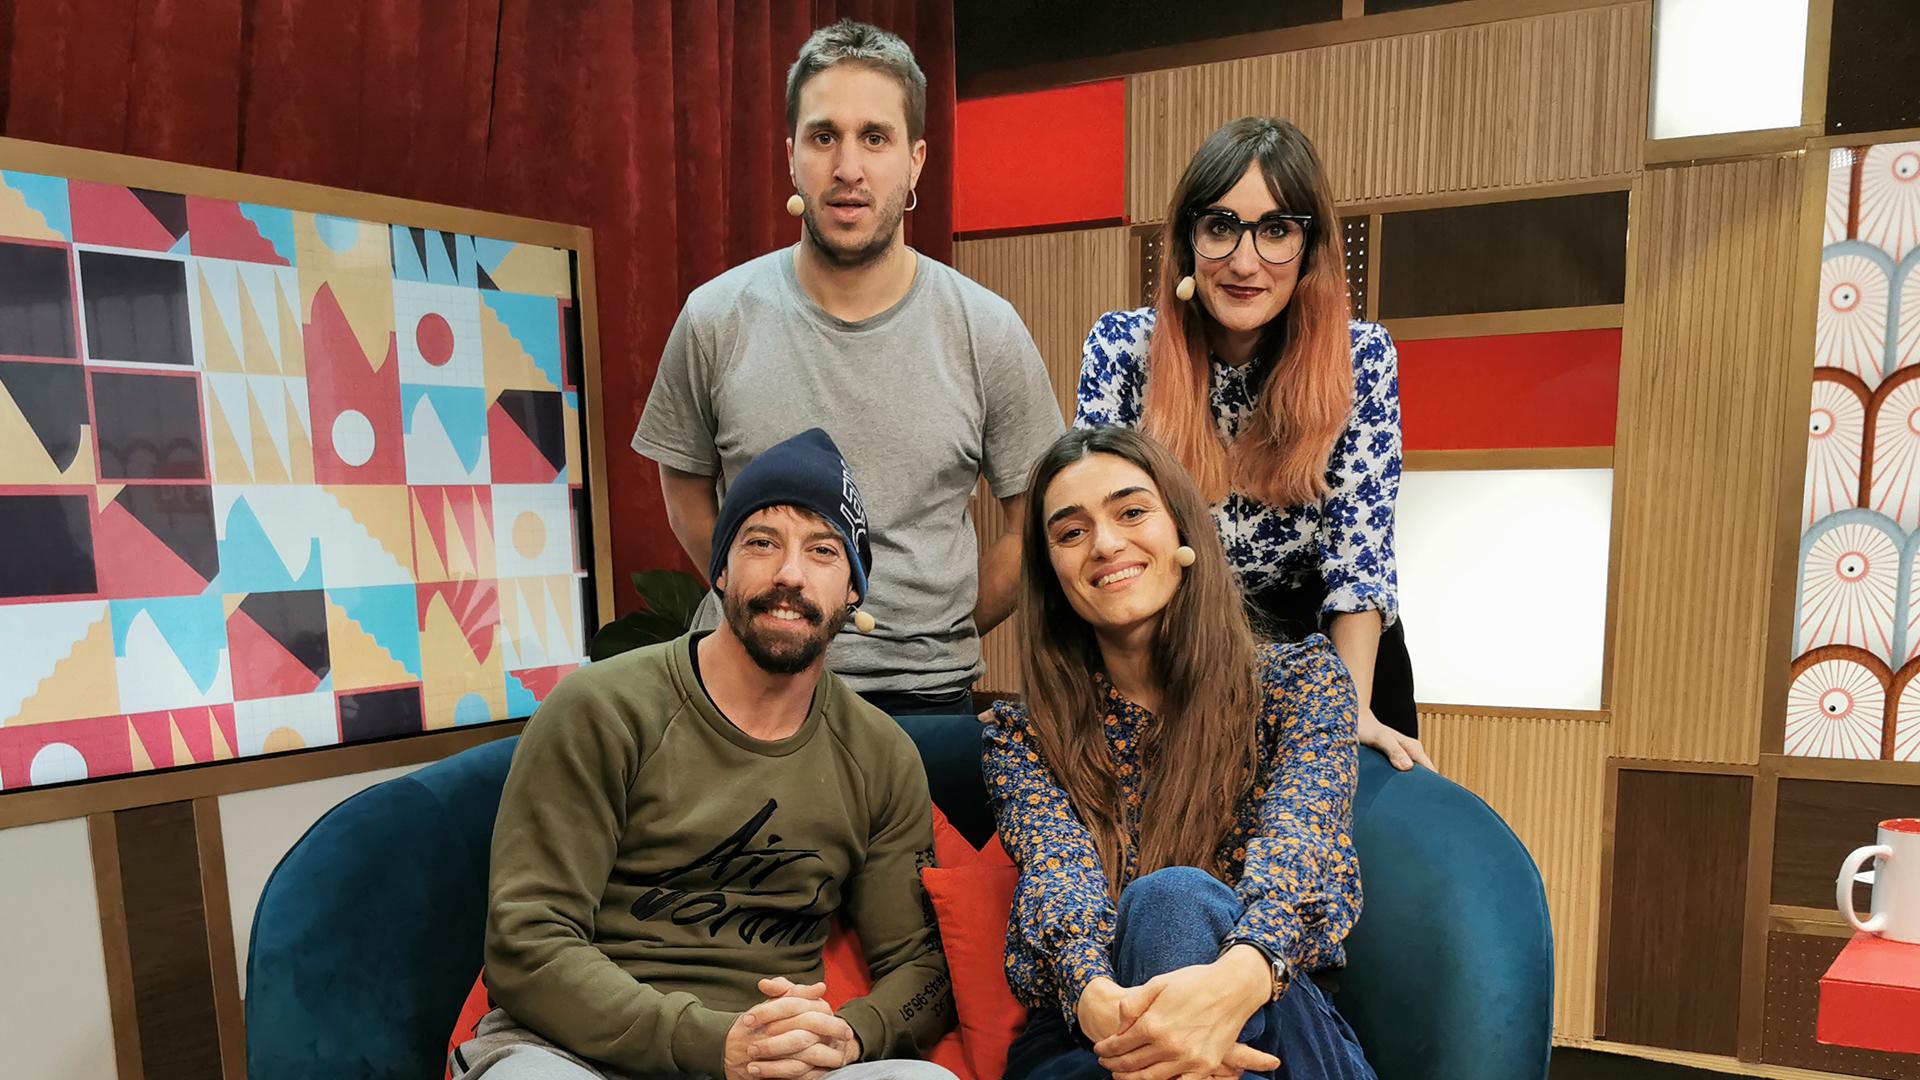 2019 (03-12-19) Olivia Molina, Adrián Lastra y Monismurf